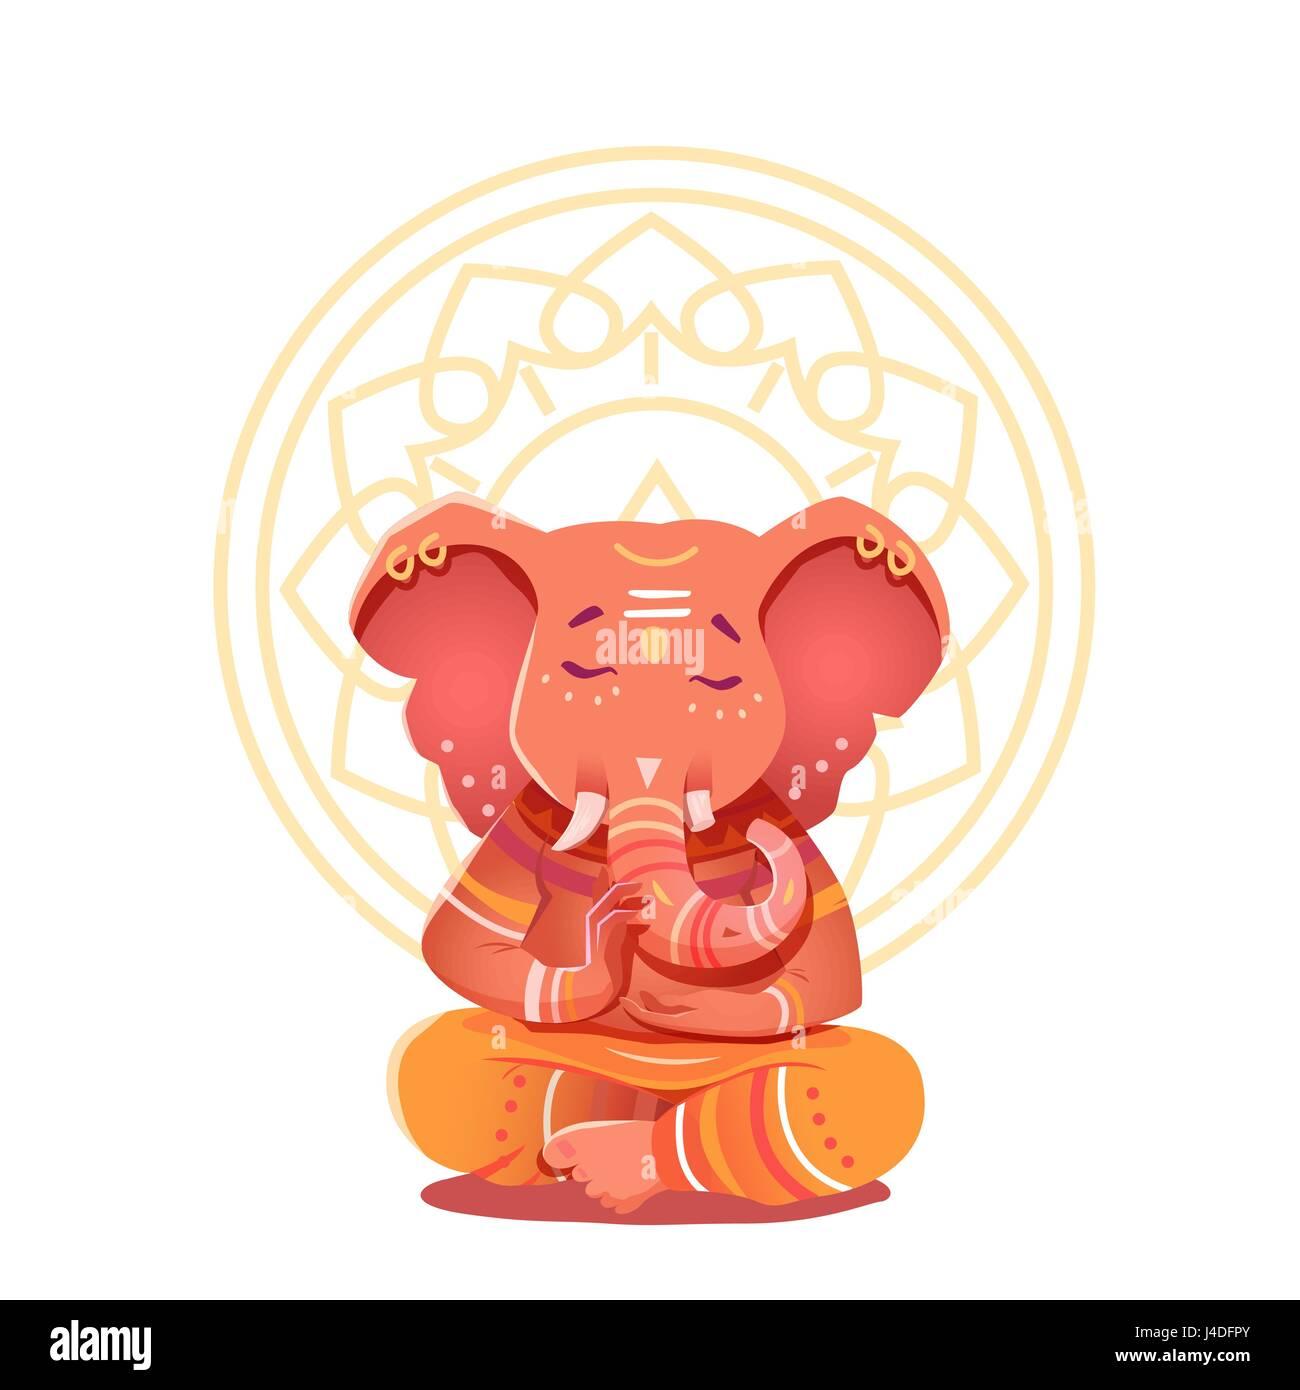 Ganesha Illustration in the lotus position. Mythological deities of India. Vector illustration of a deity with elephant - Stock Image